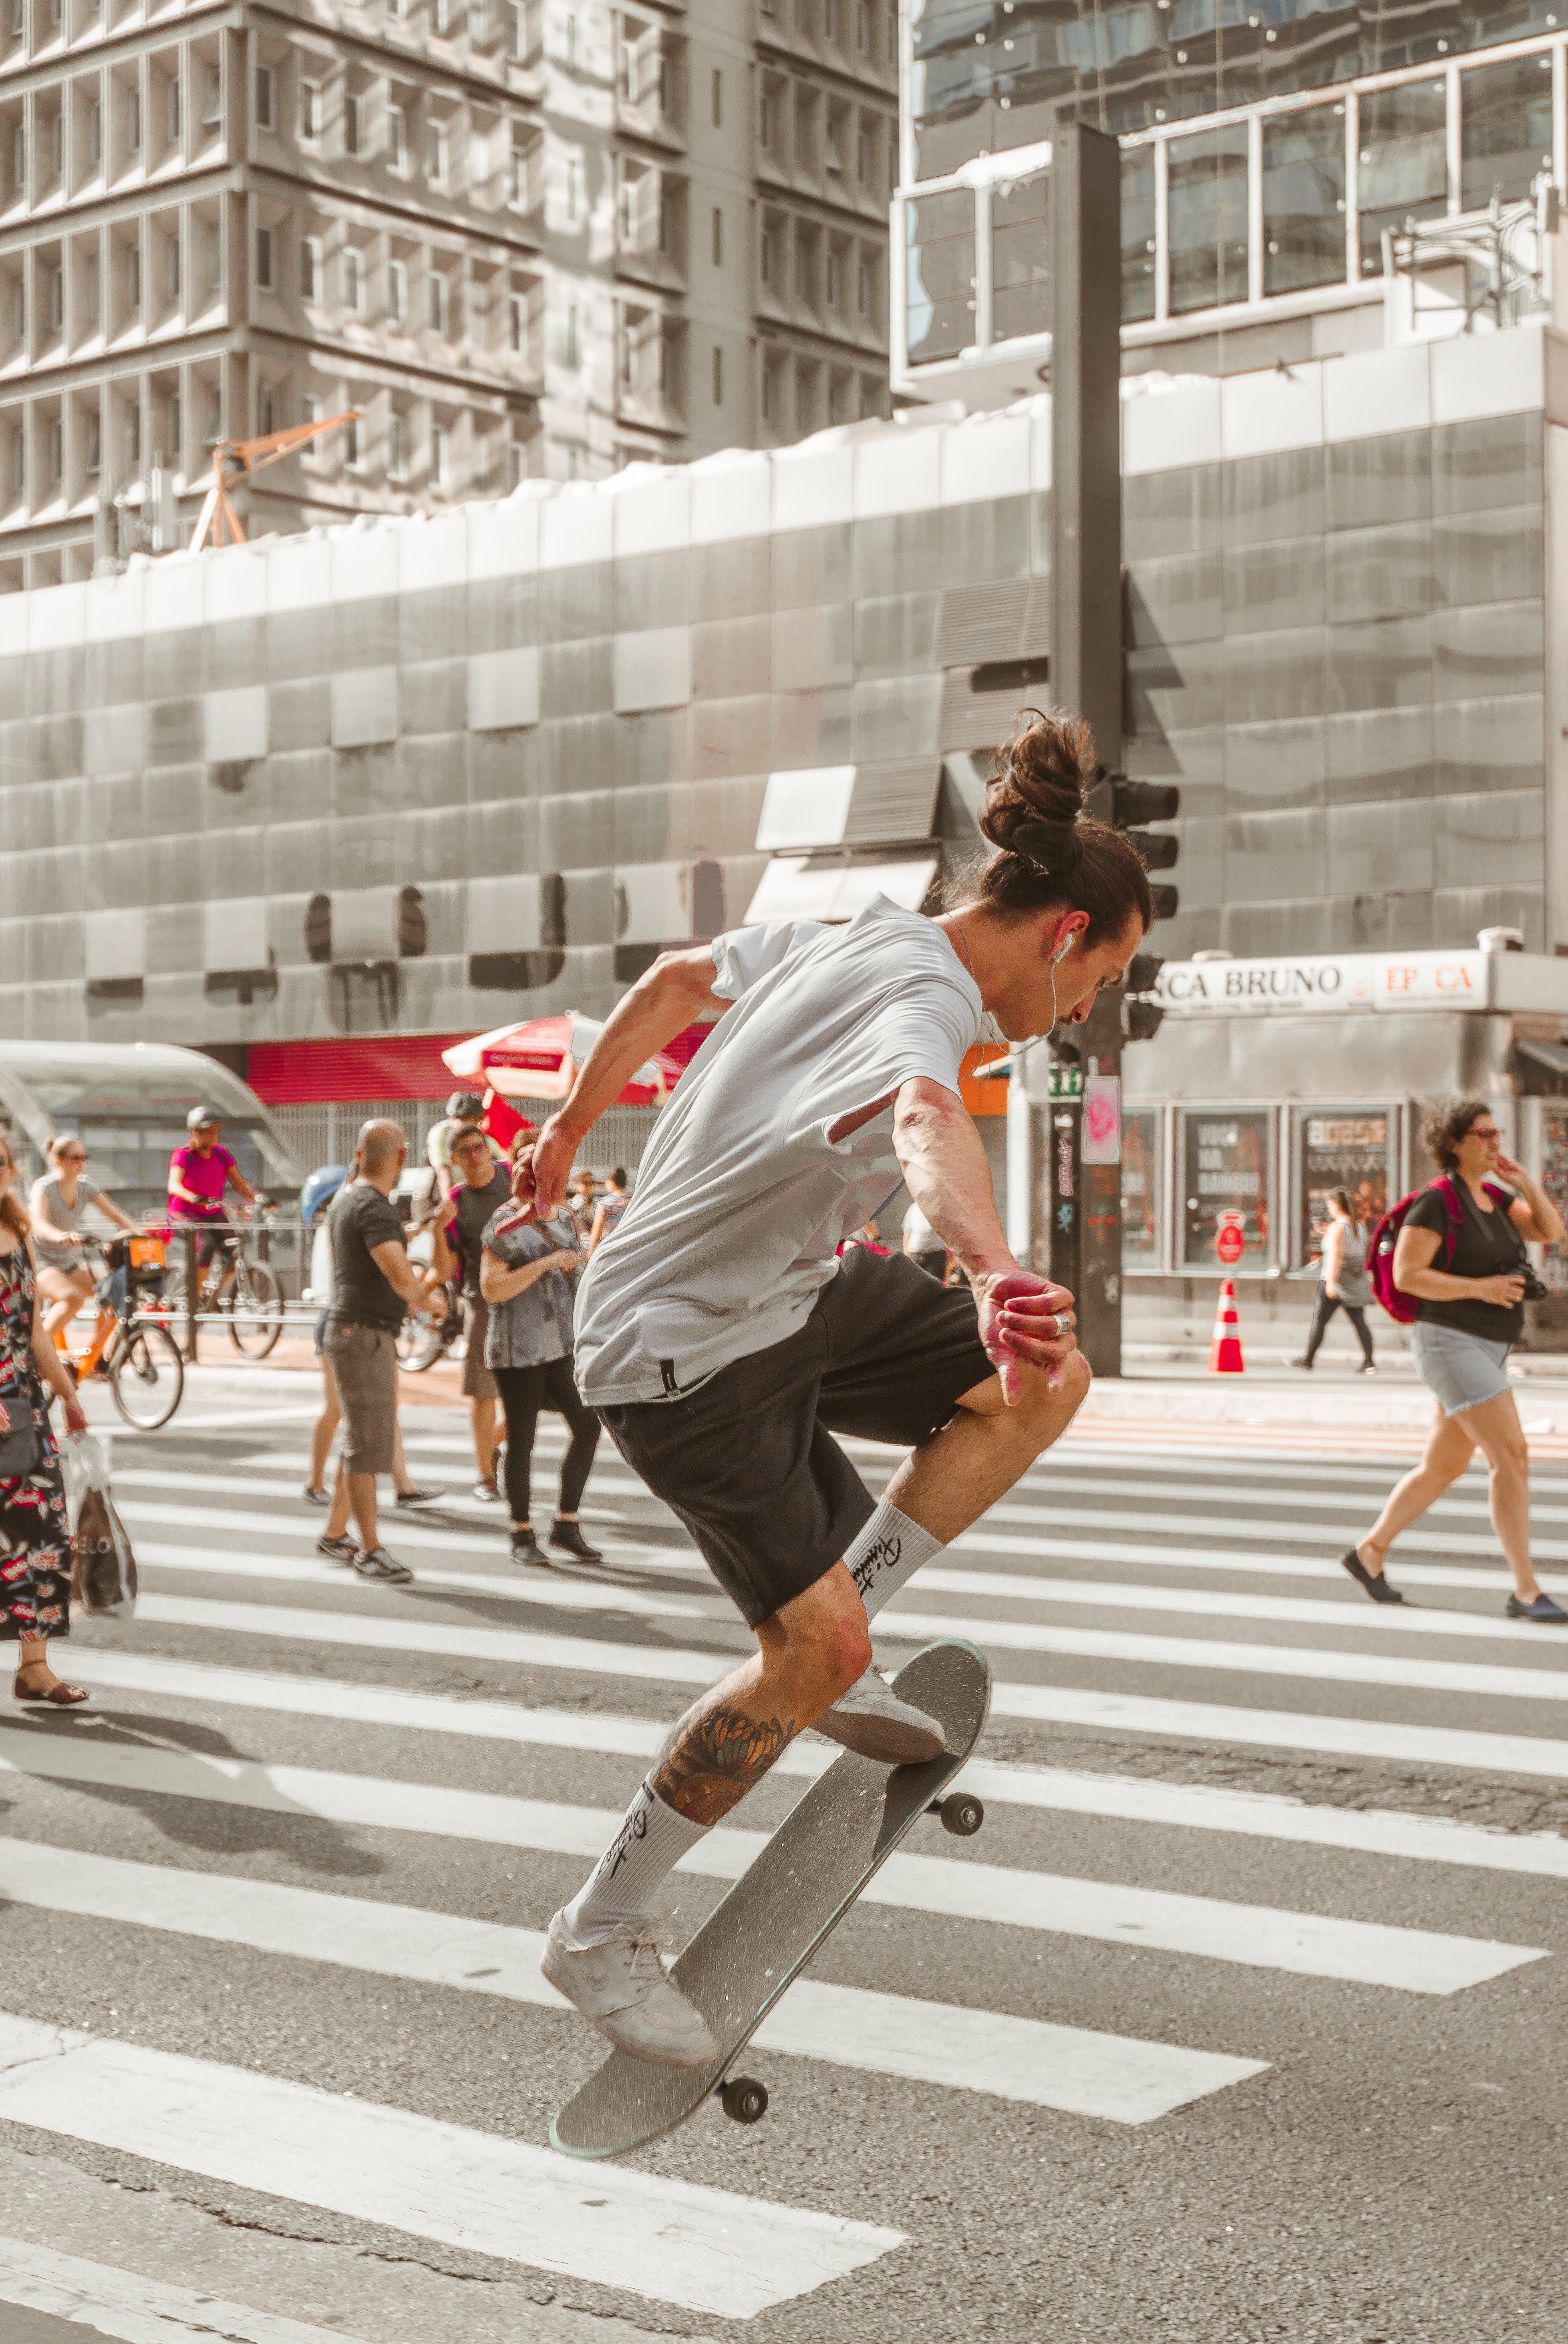 Photo of Man Riding Skateboard on Pedestrian